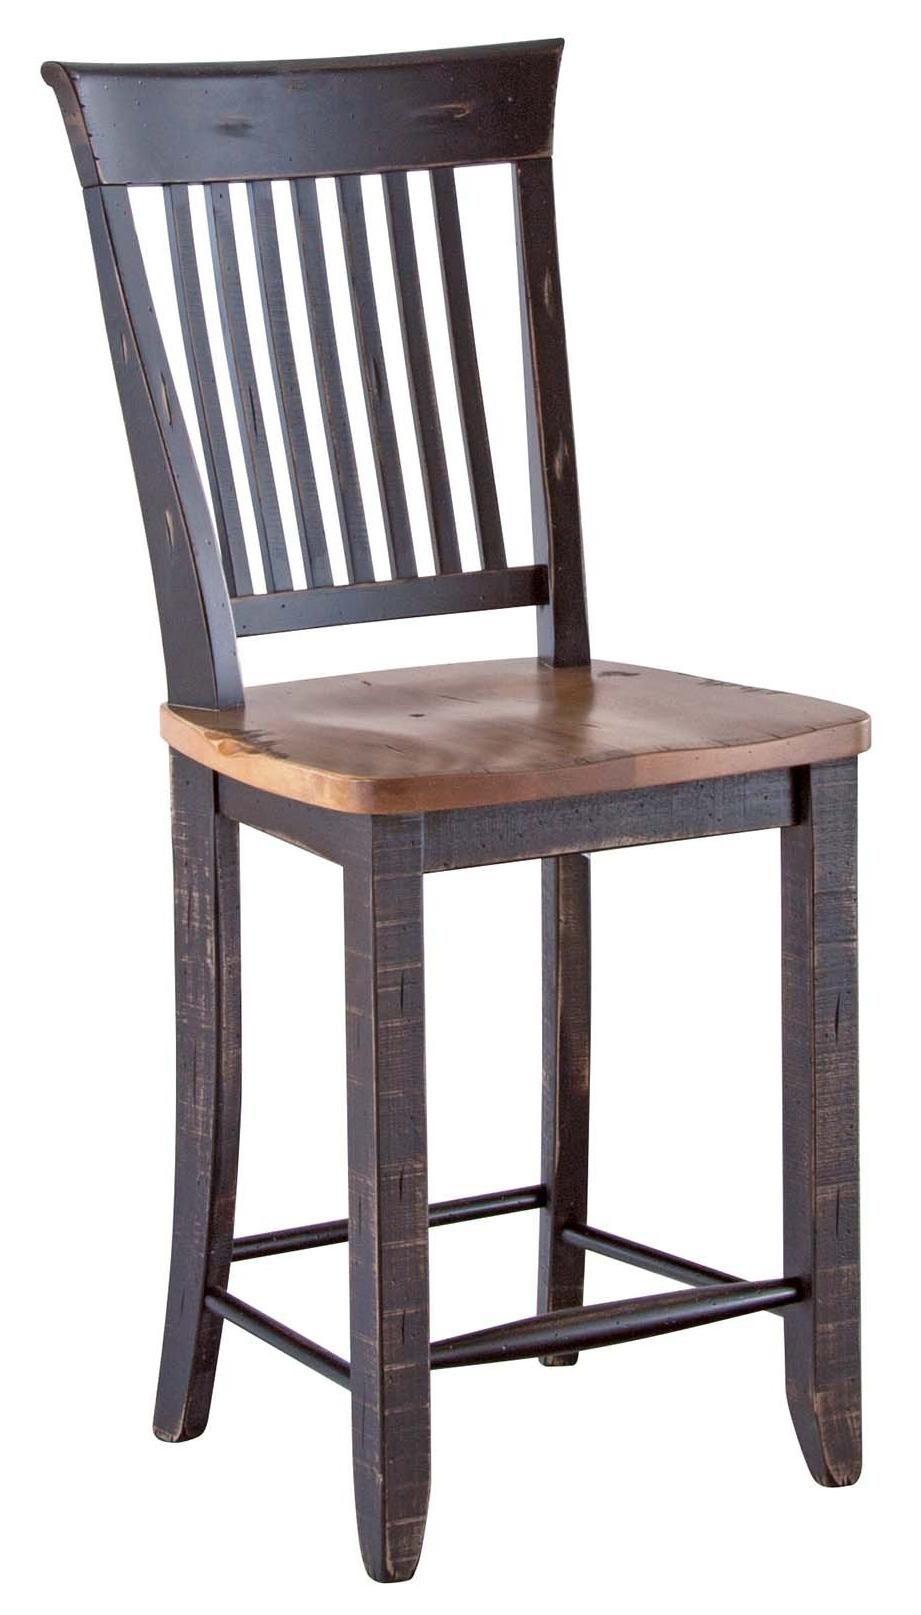 Pin by on farmhouse kitchen Bar stools, Stool